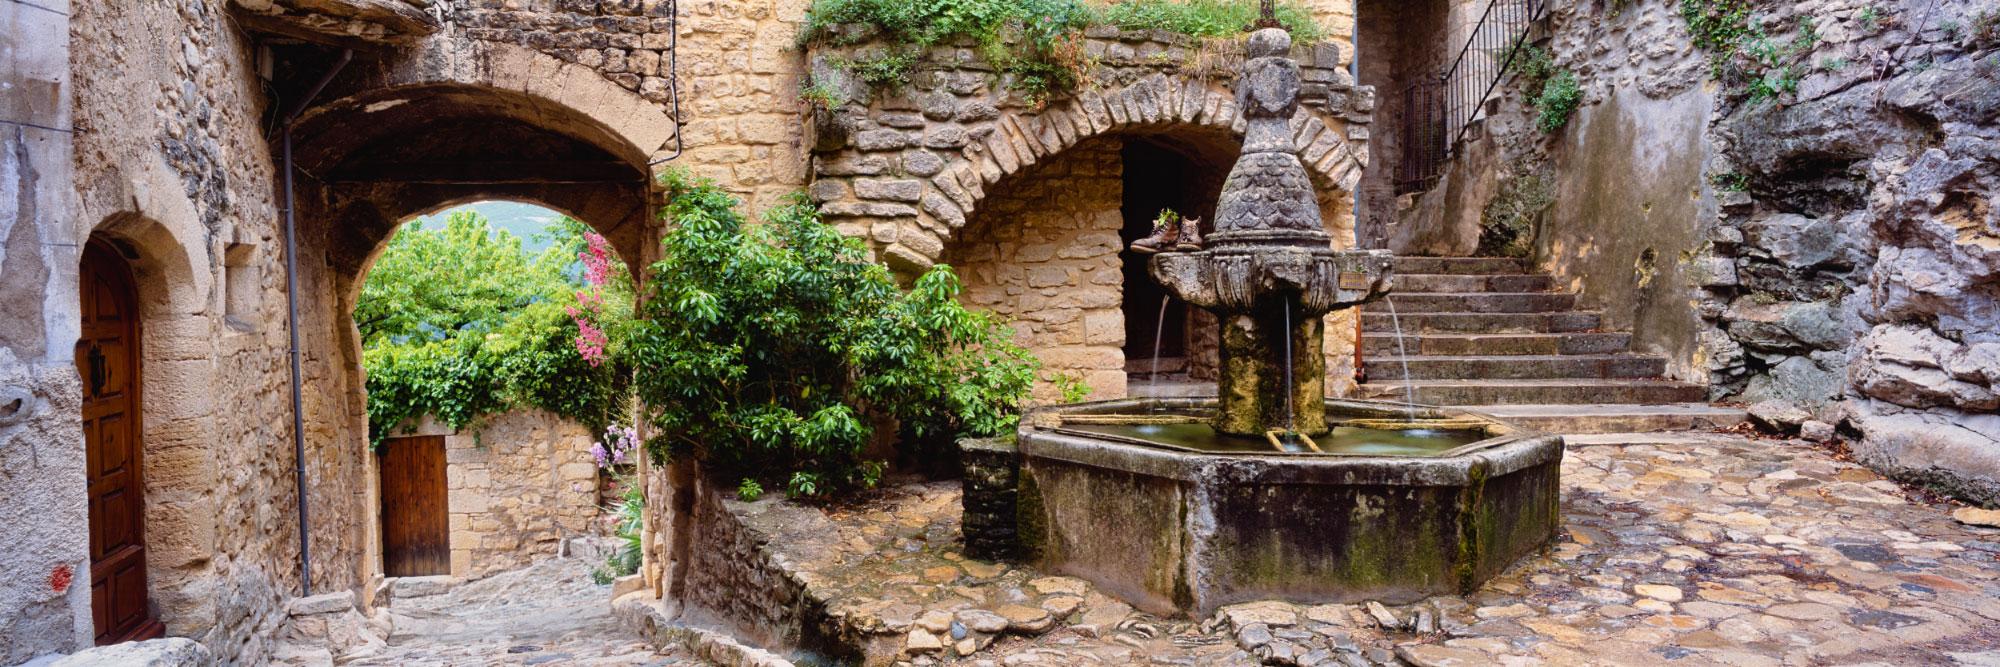 Fontaine de Crestet